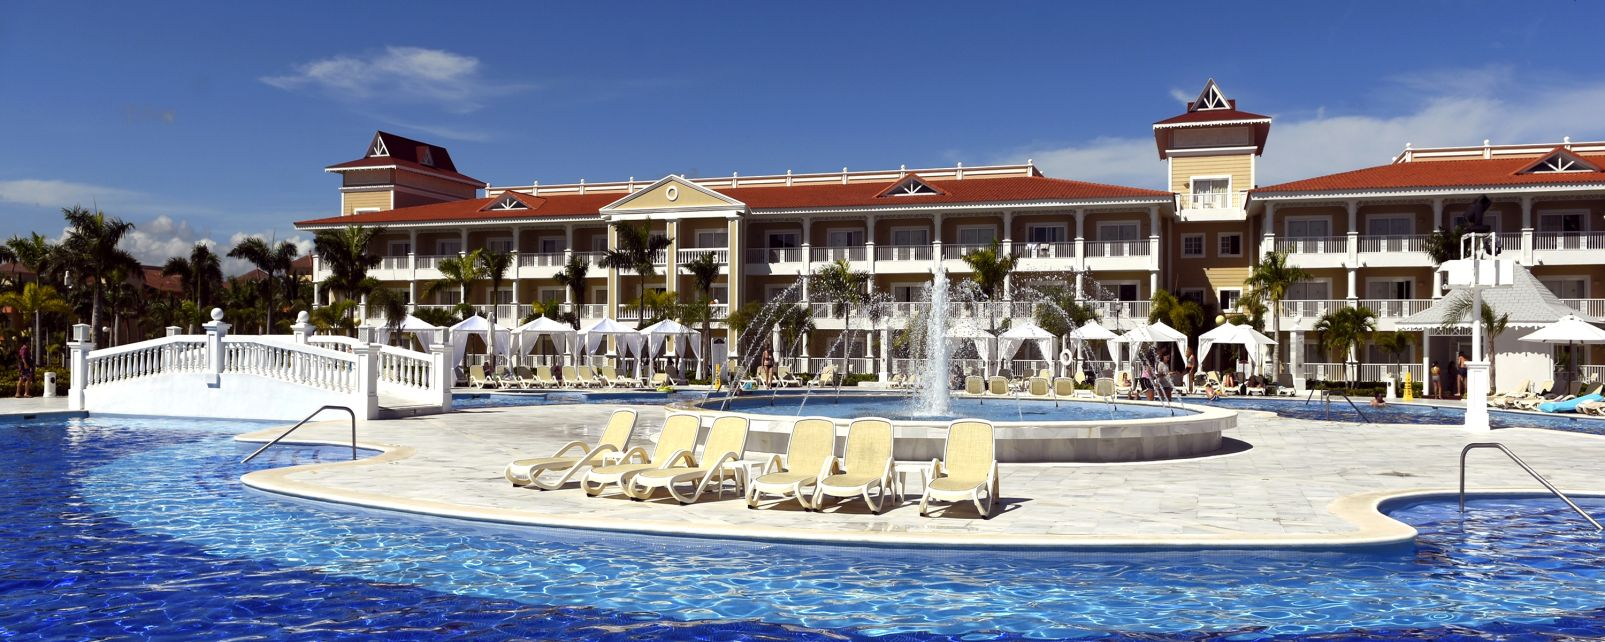 Hôtel Luxury Bahia Principe Fantasia